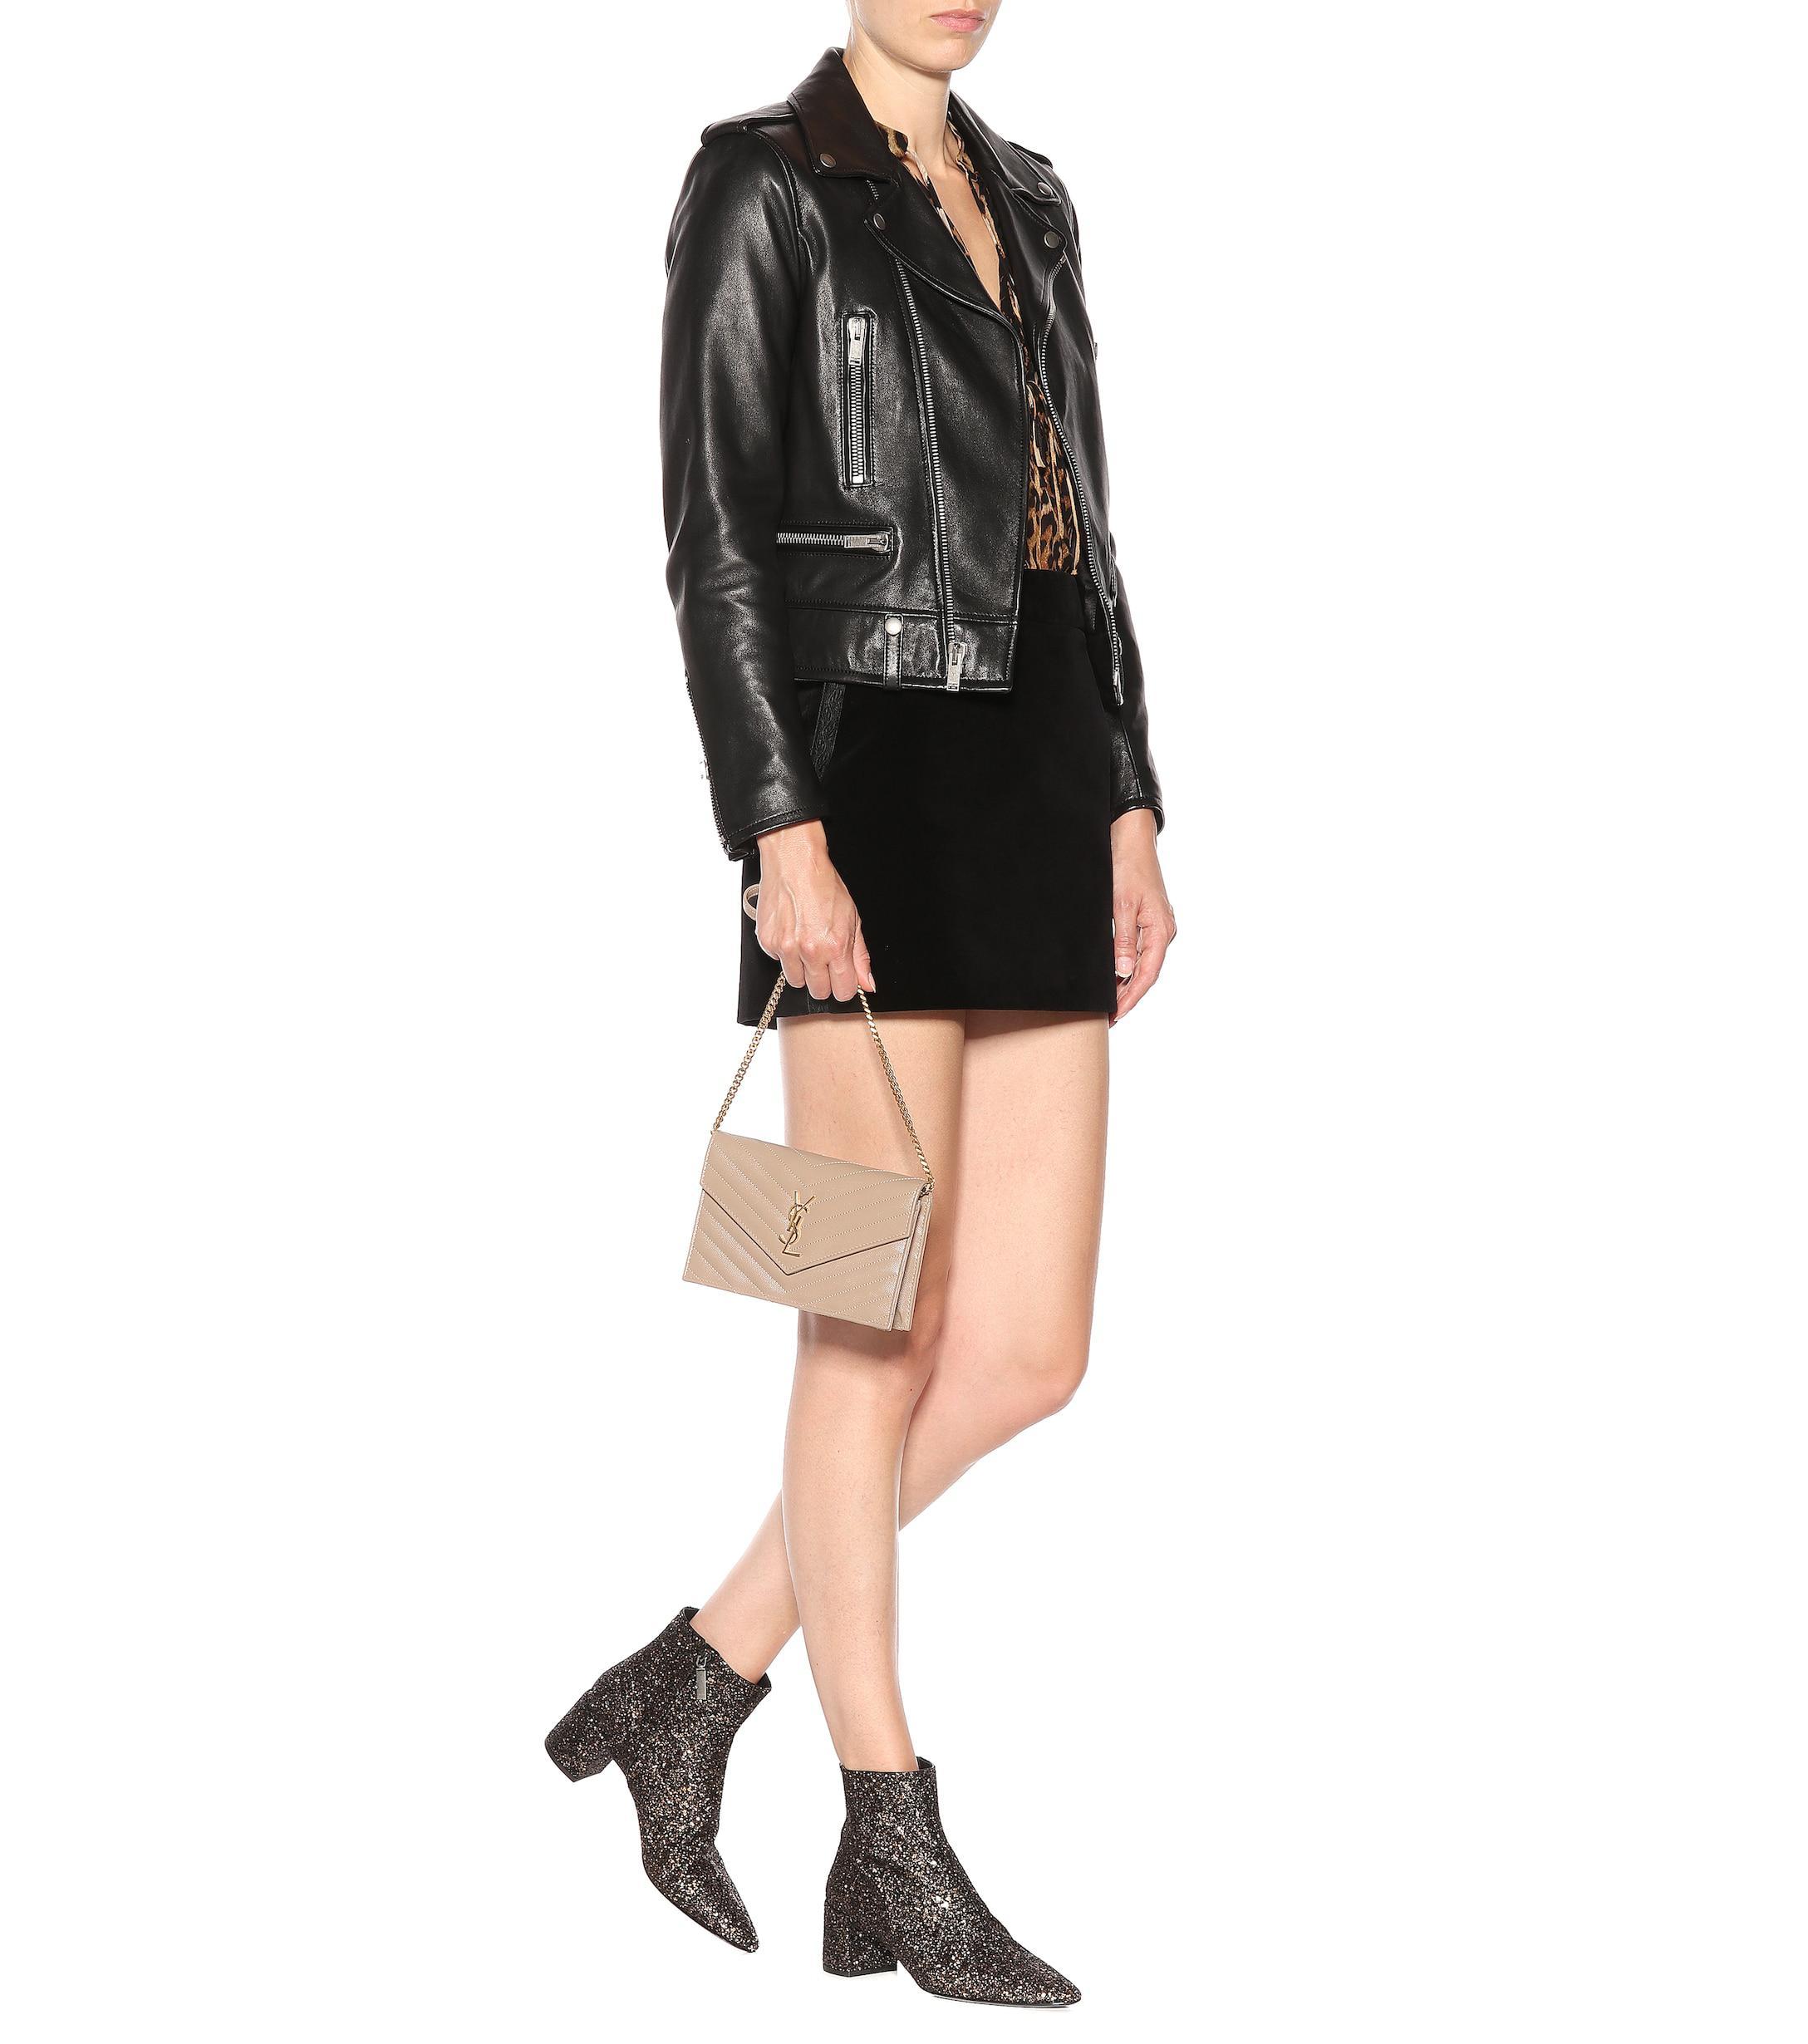 9f1897b9024 Saint Laurent - Metallic Loulou 50 Glitter Ankle Boots - Lyst. View  fullscreen